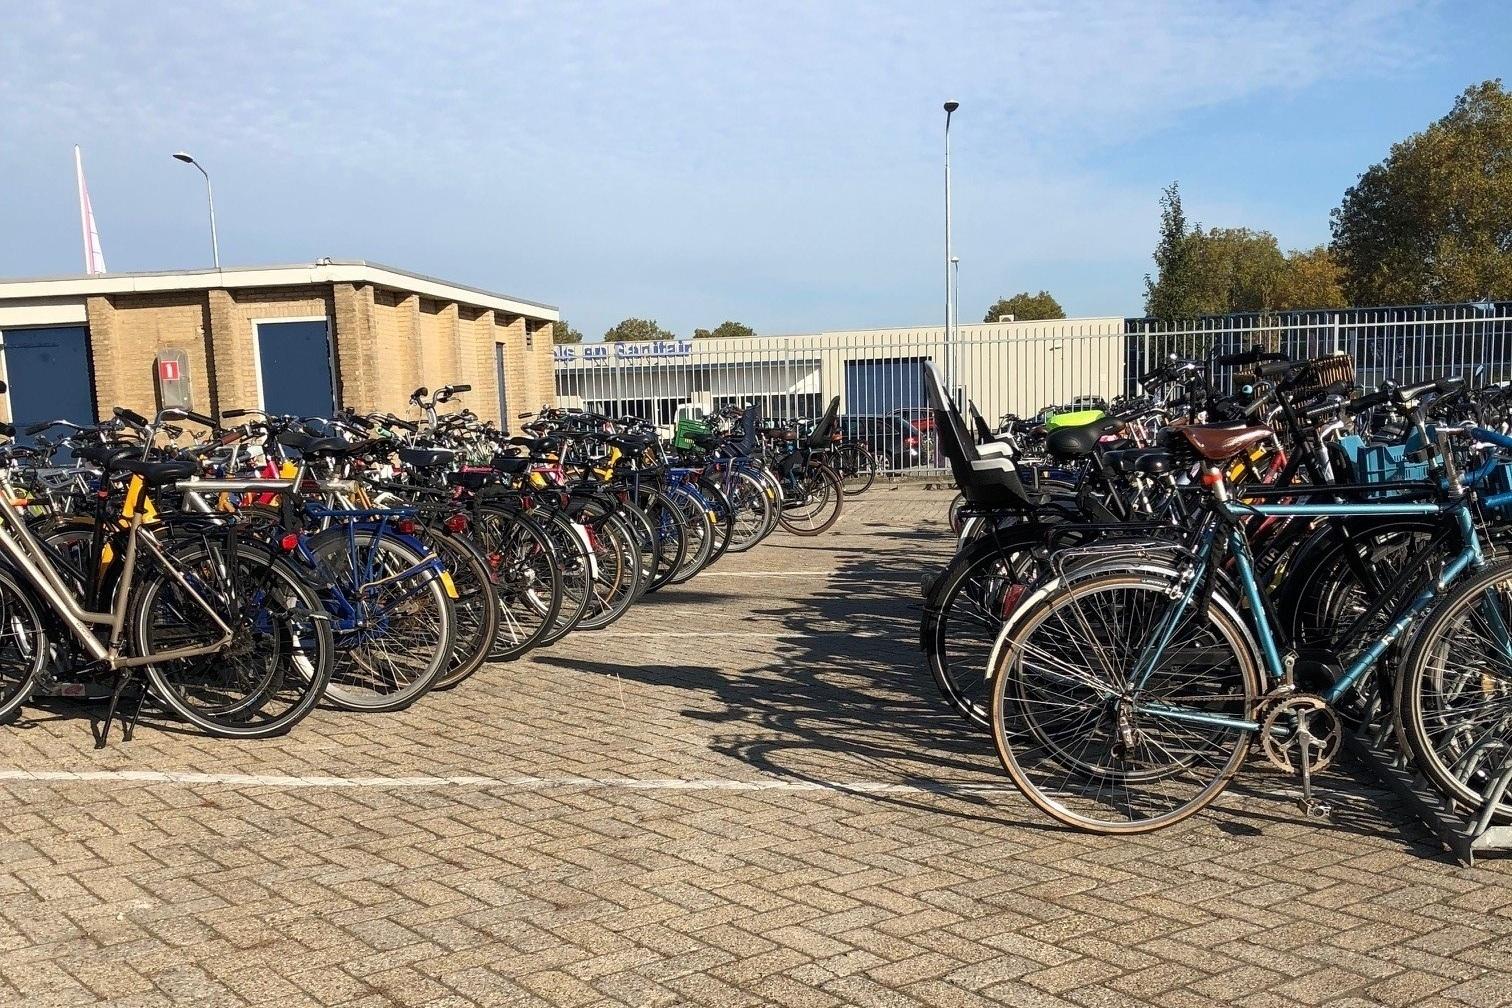 Bikes everywhere! At Dutch Design Week